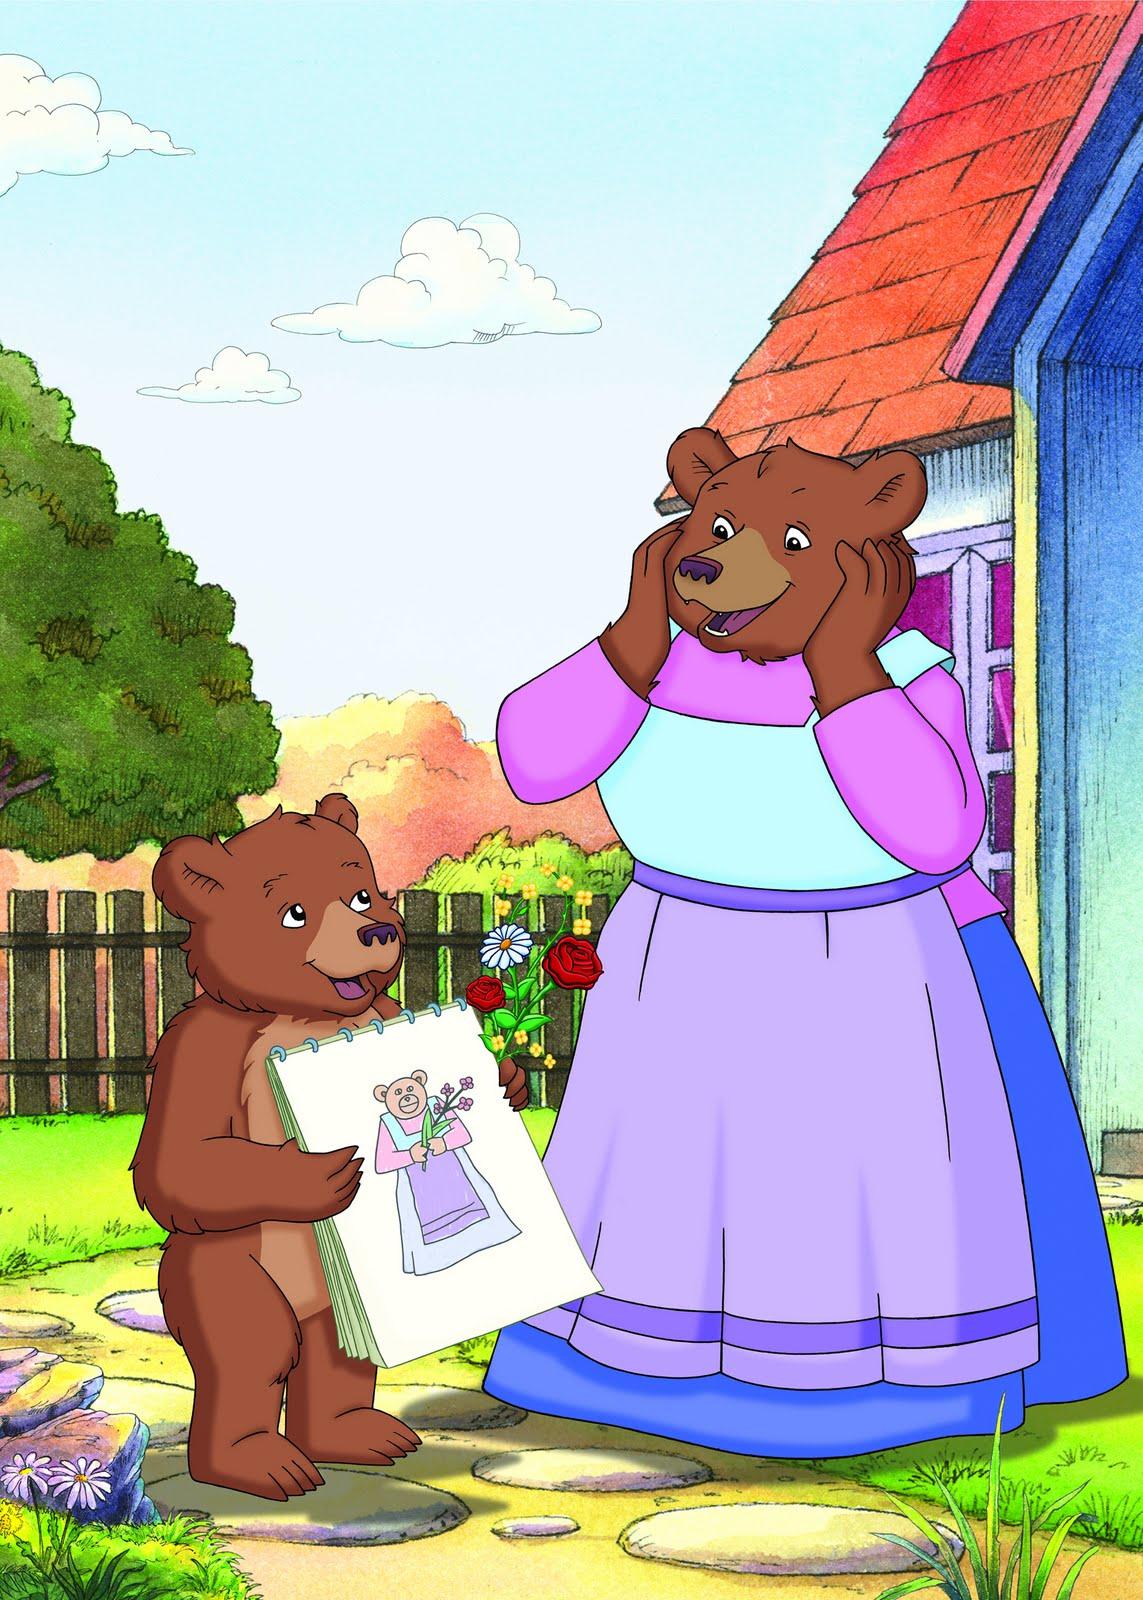 Randome clipart little bear #4